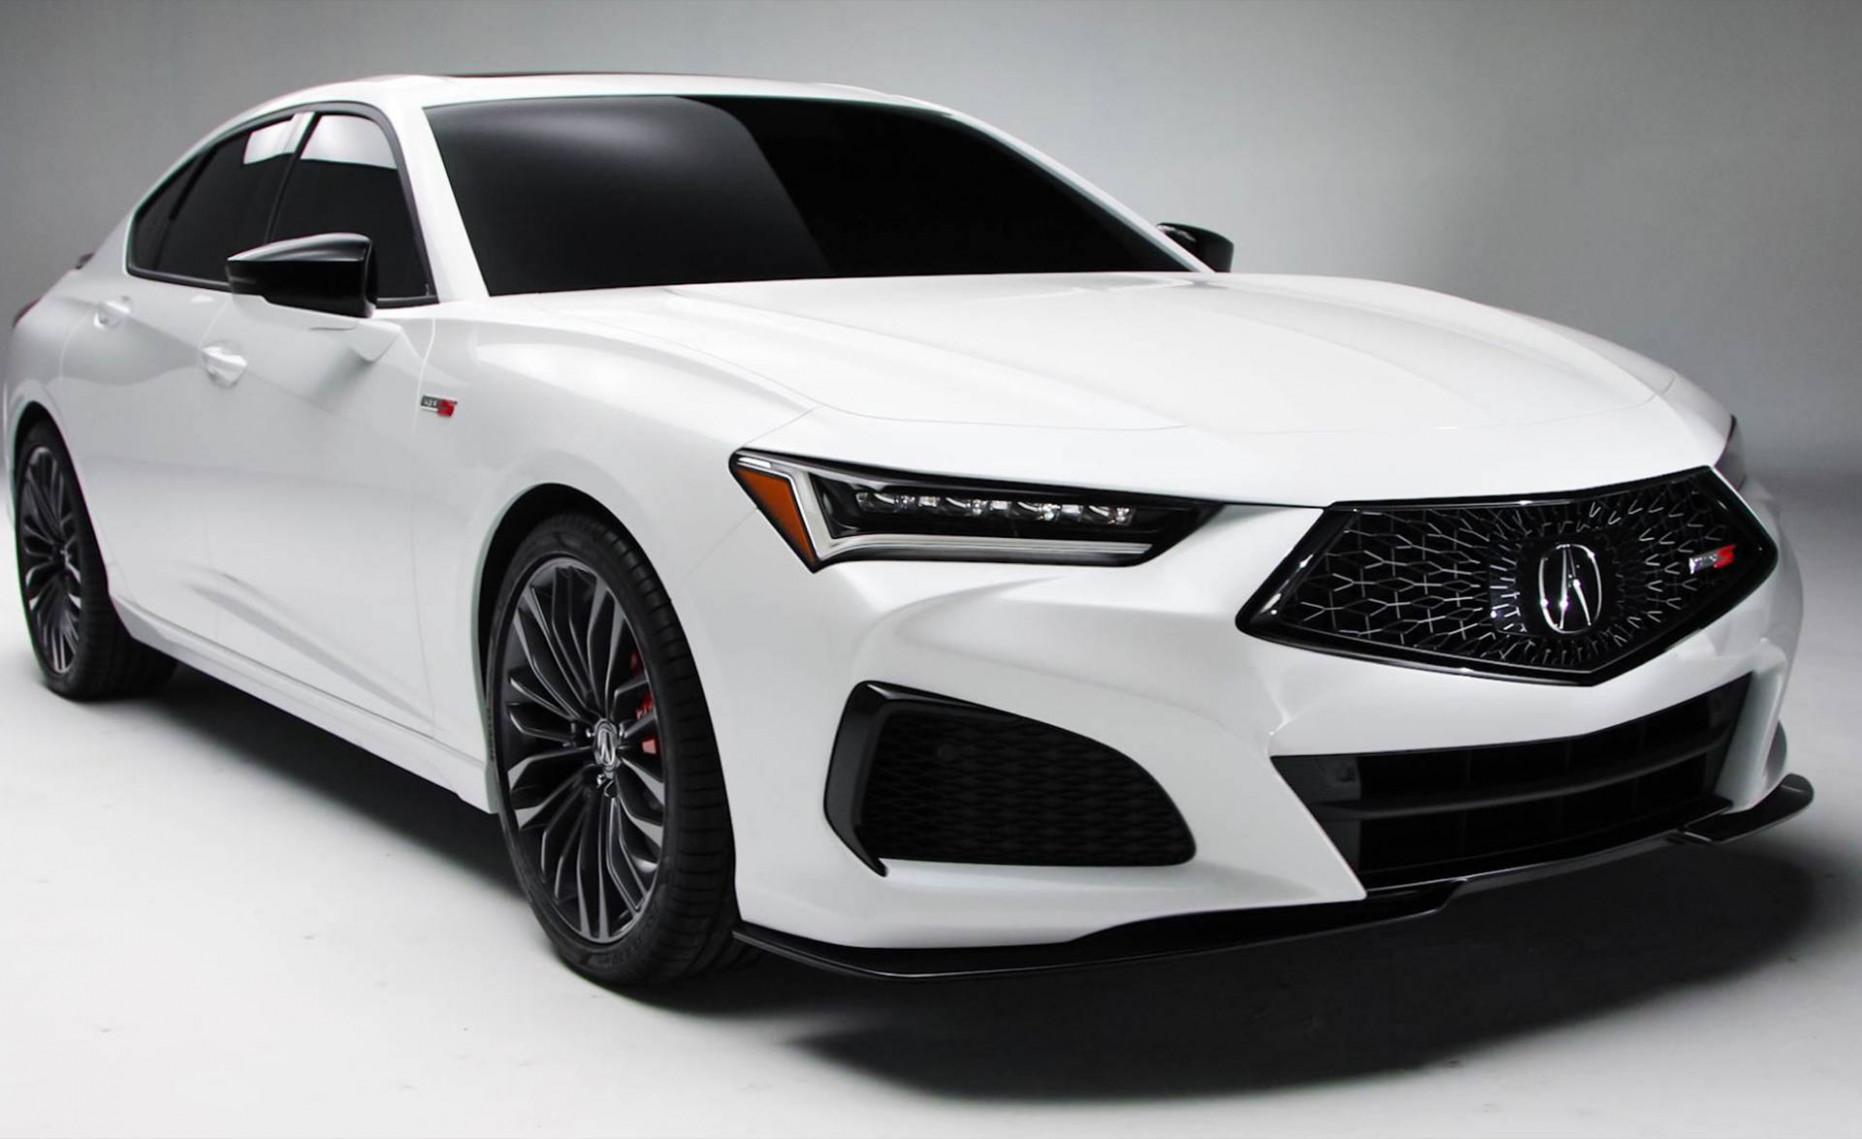 Ratings 2022 Acura RLX